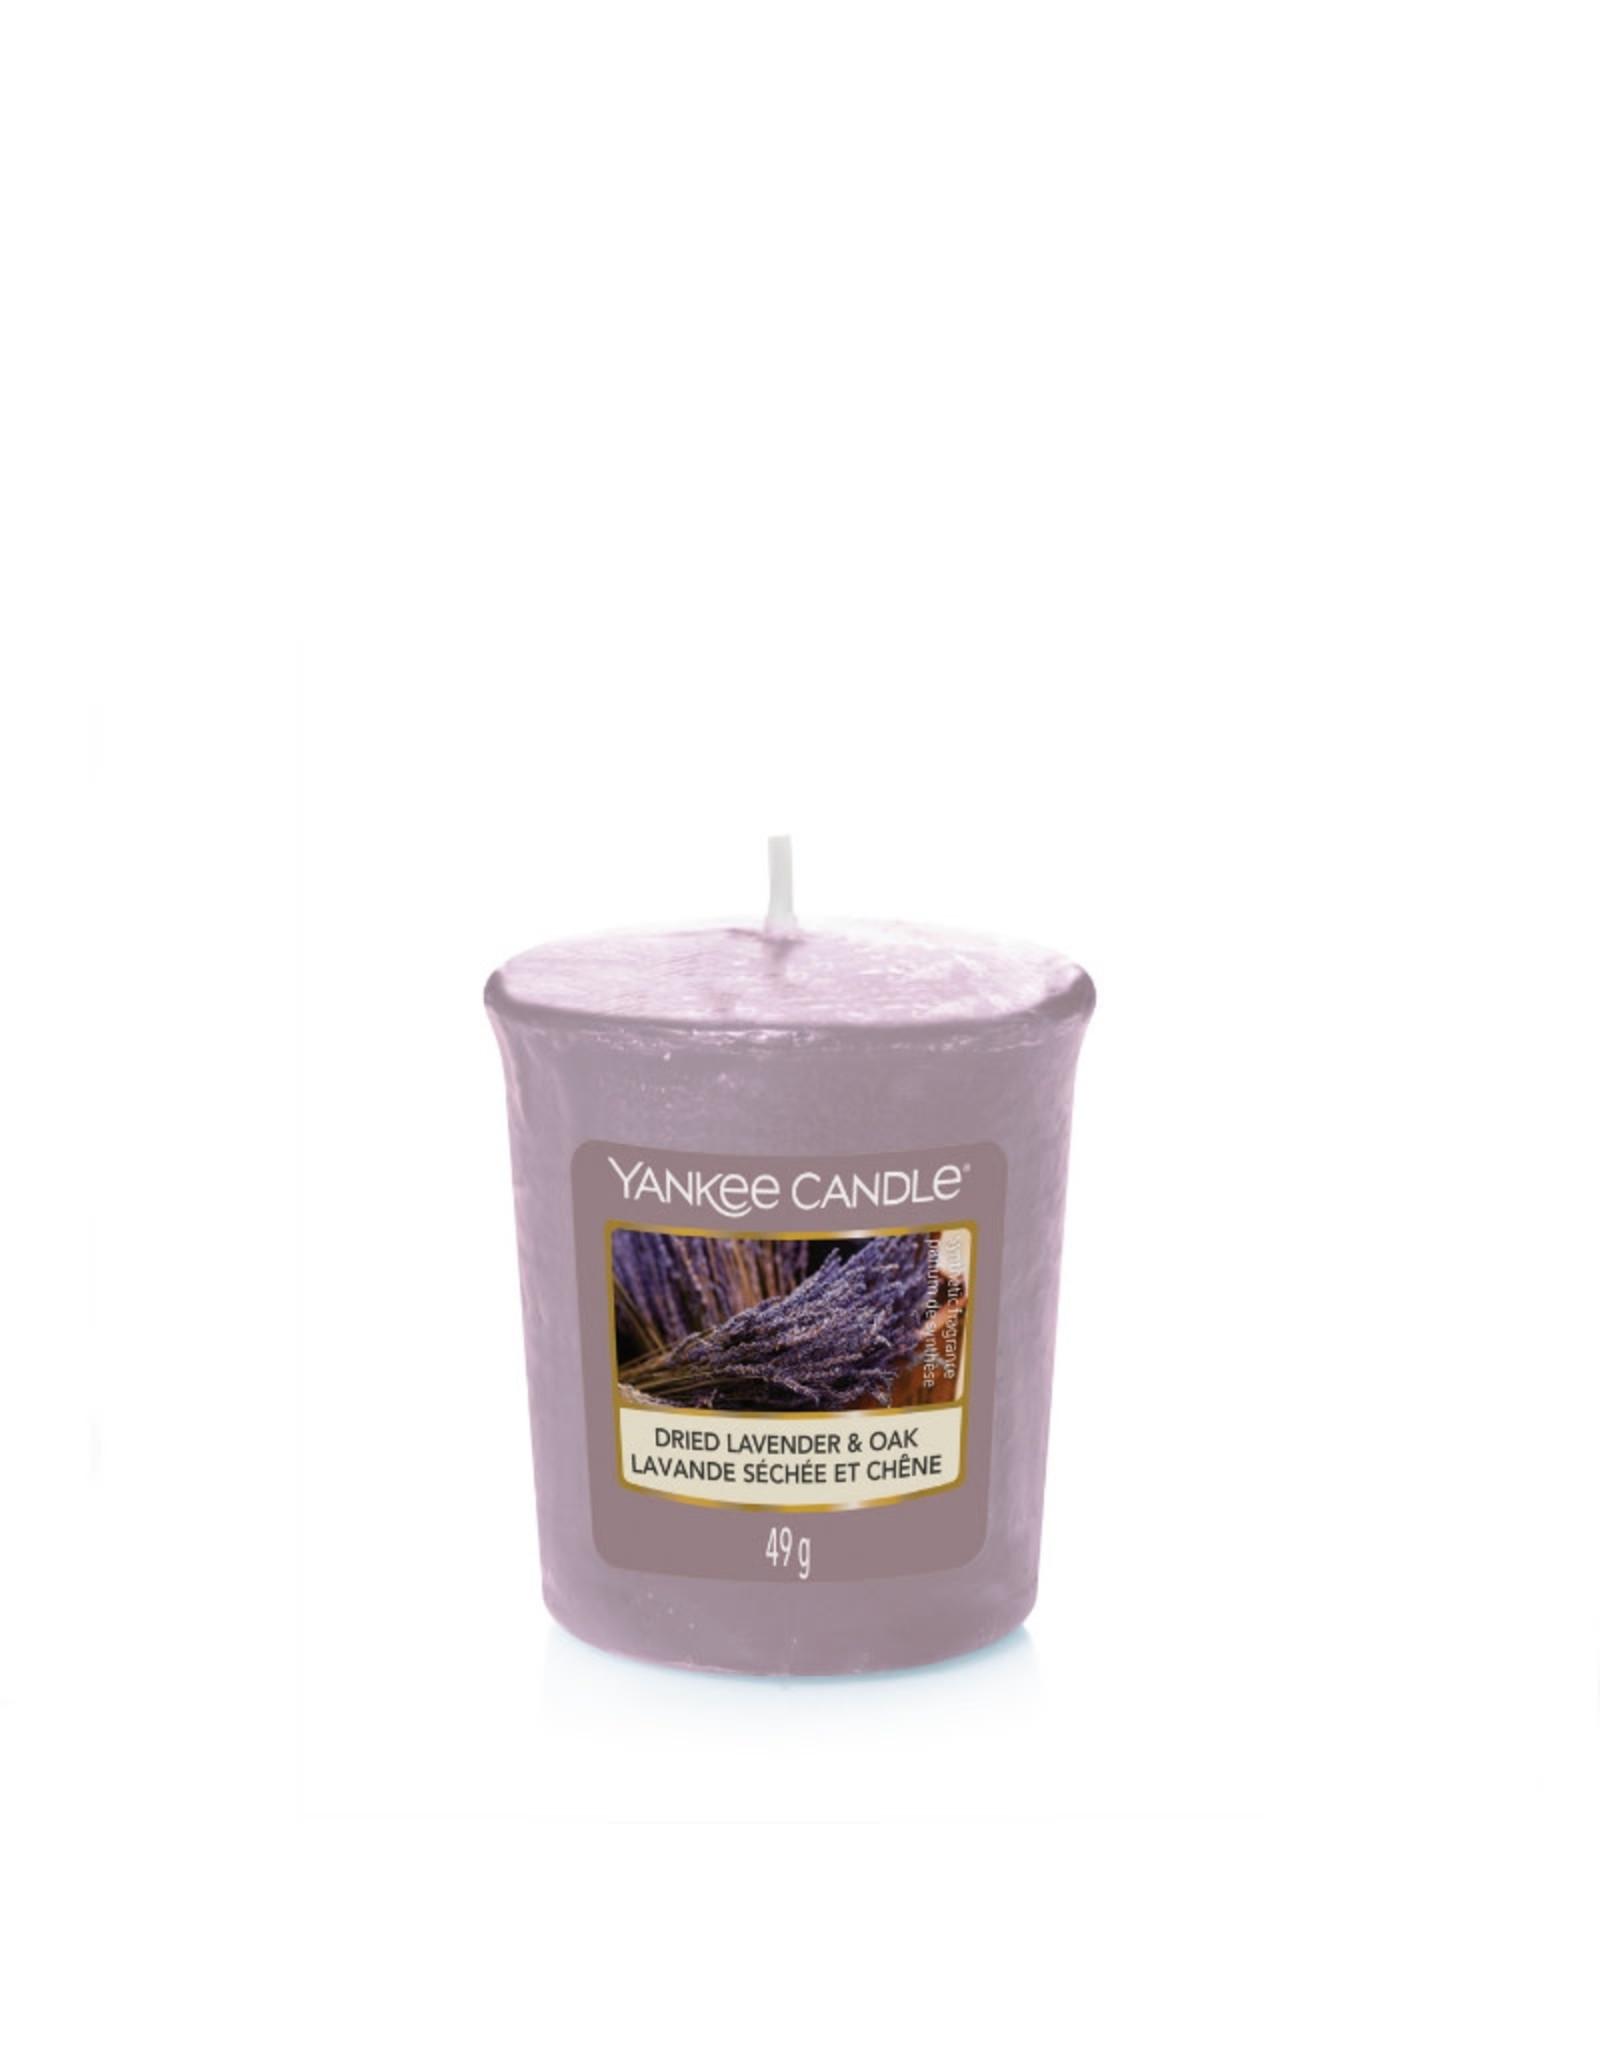 Yankee Candle Dried Lavender & Oak - Votive